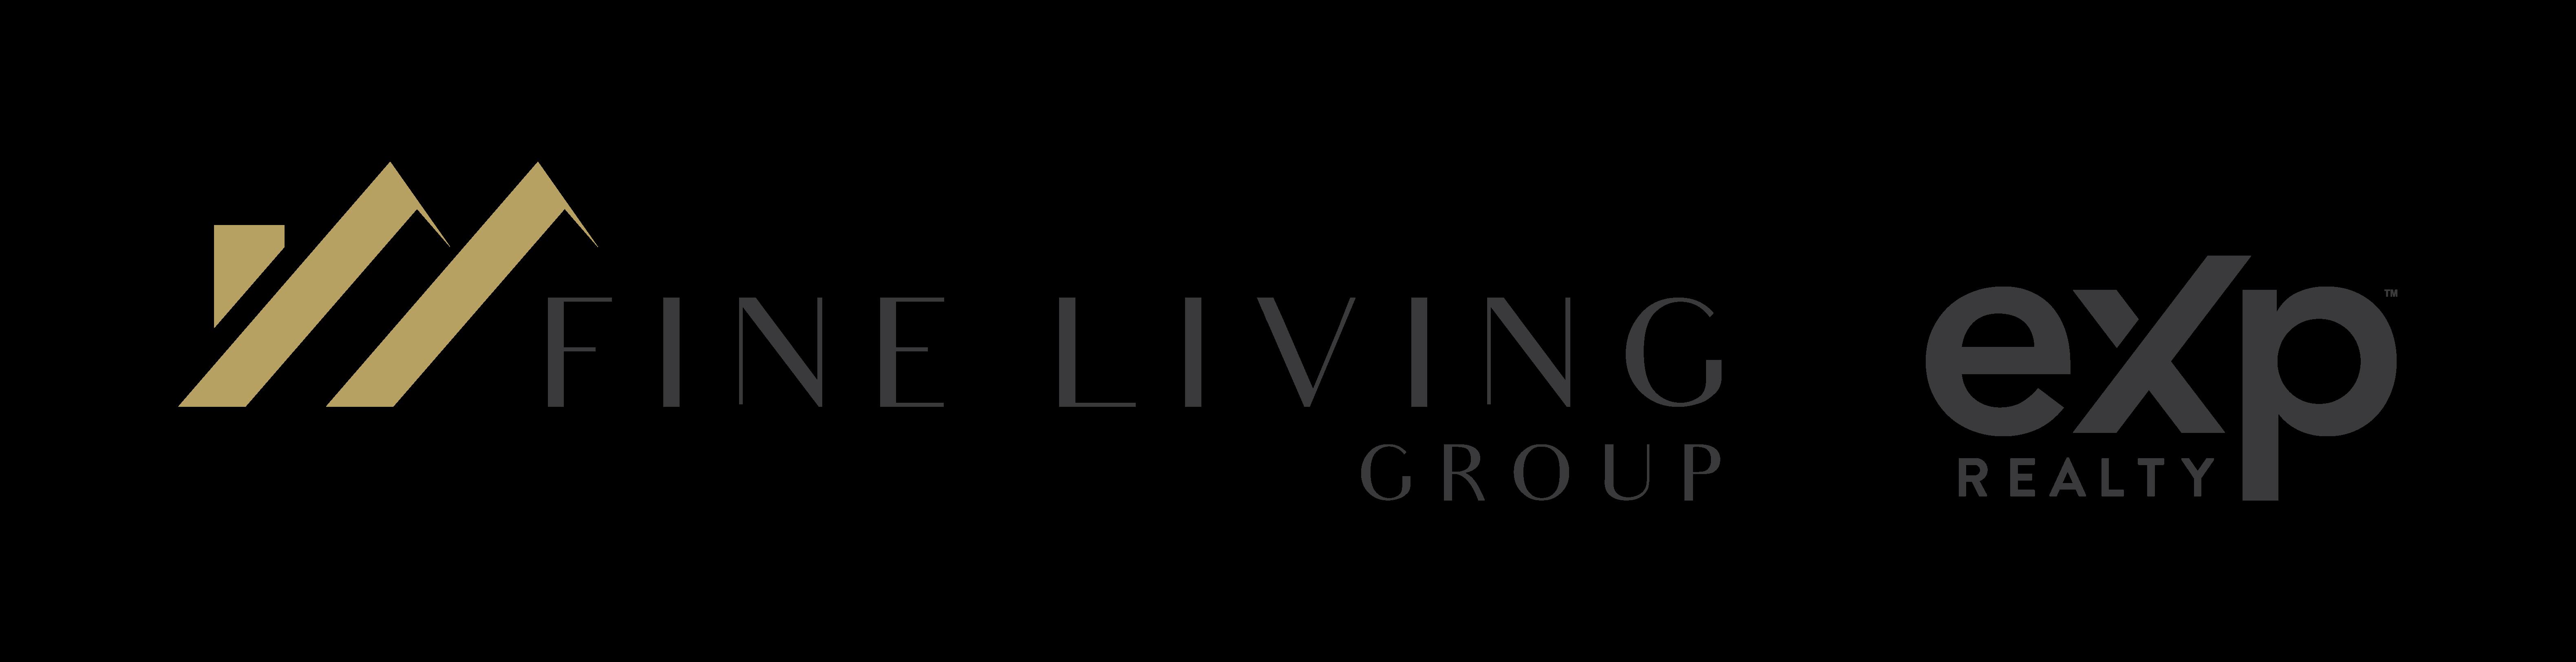 The Fine Living Group logo